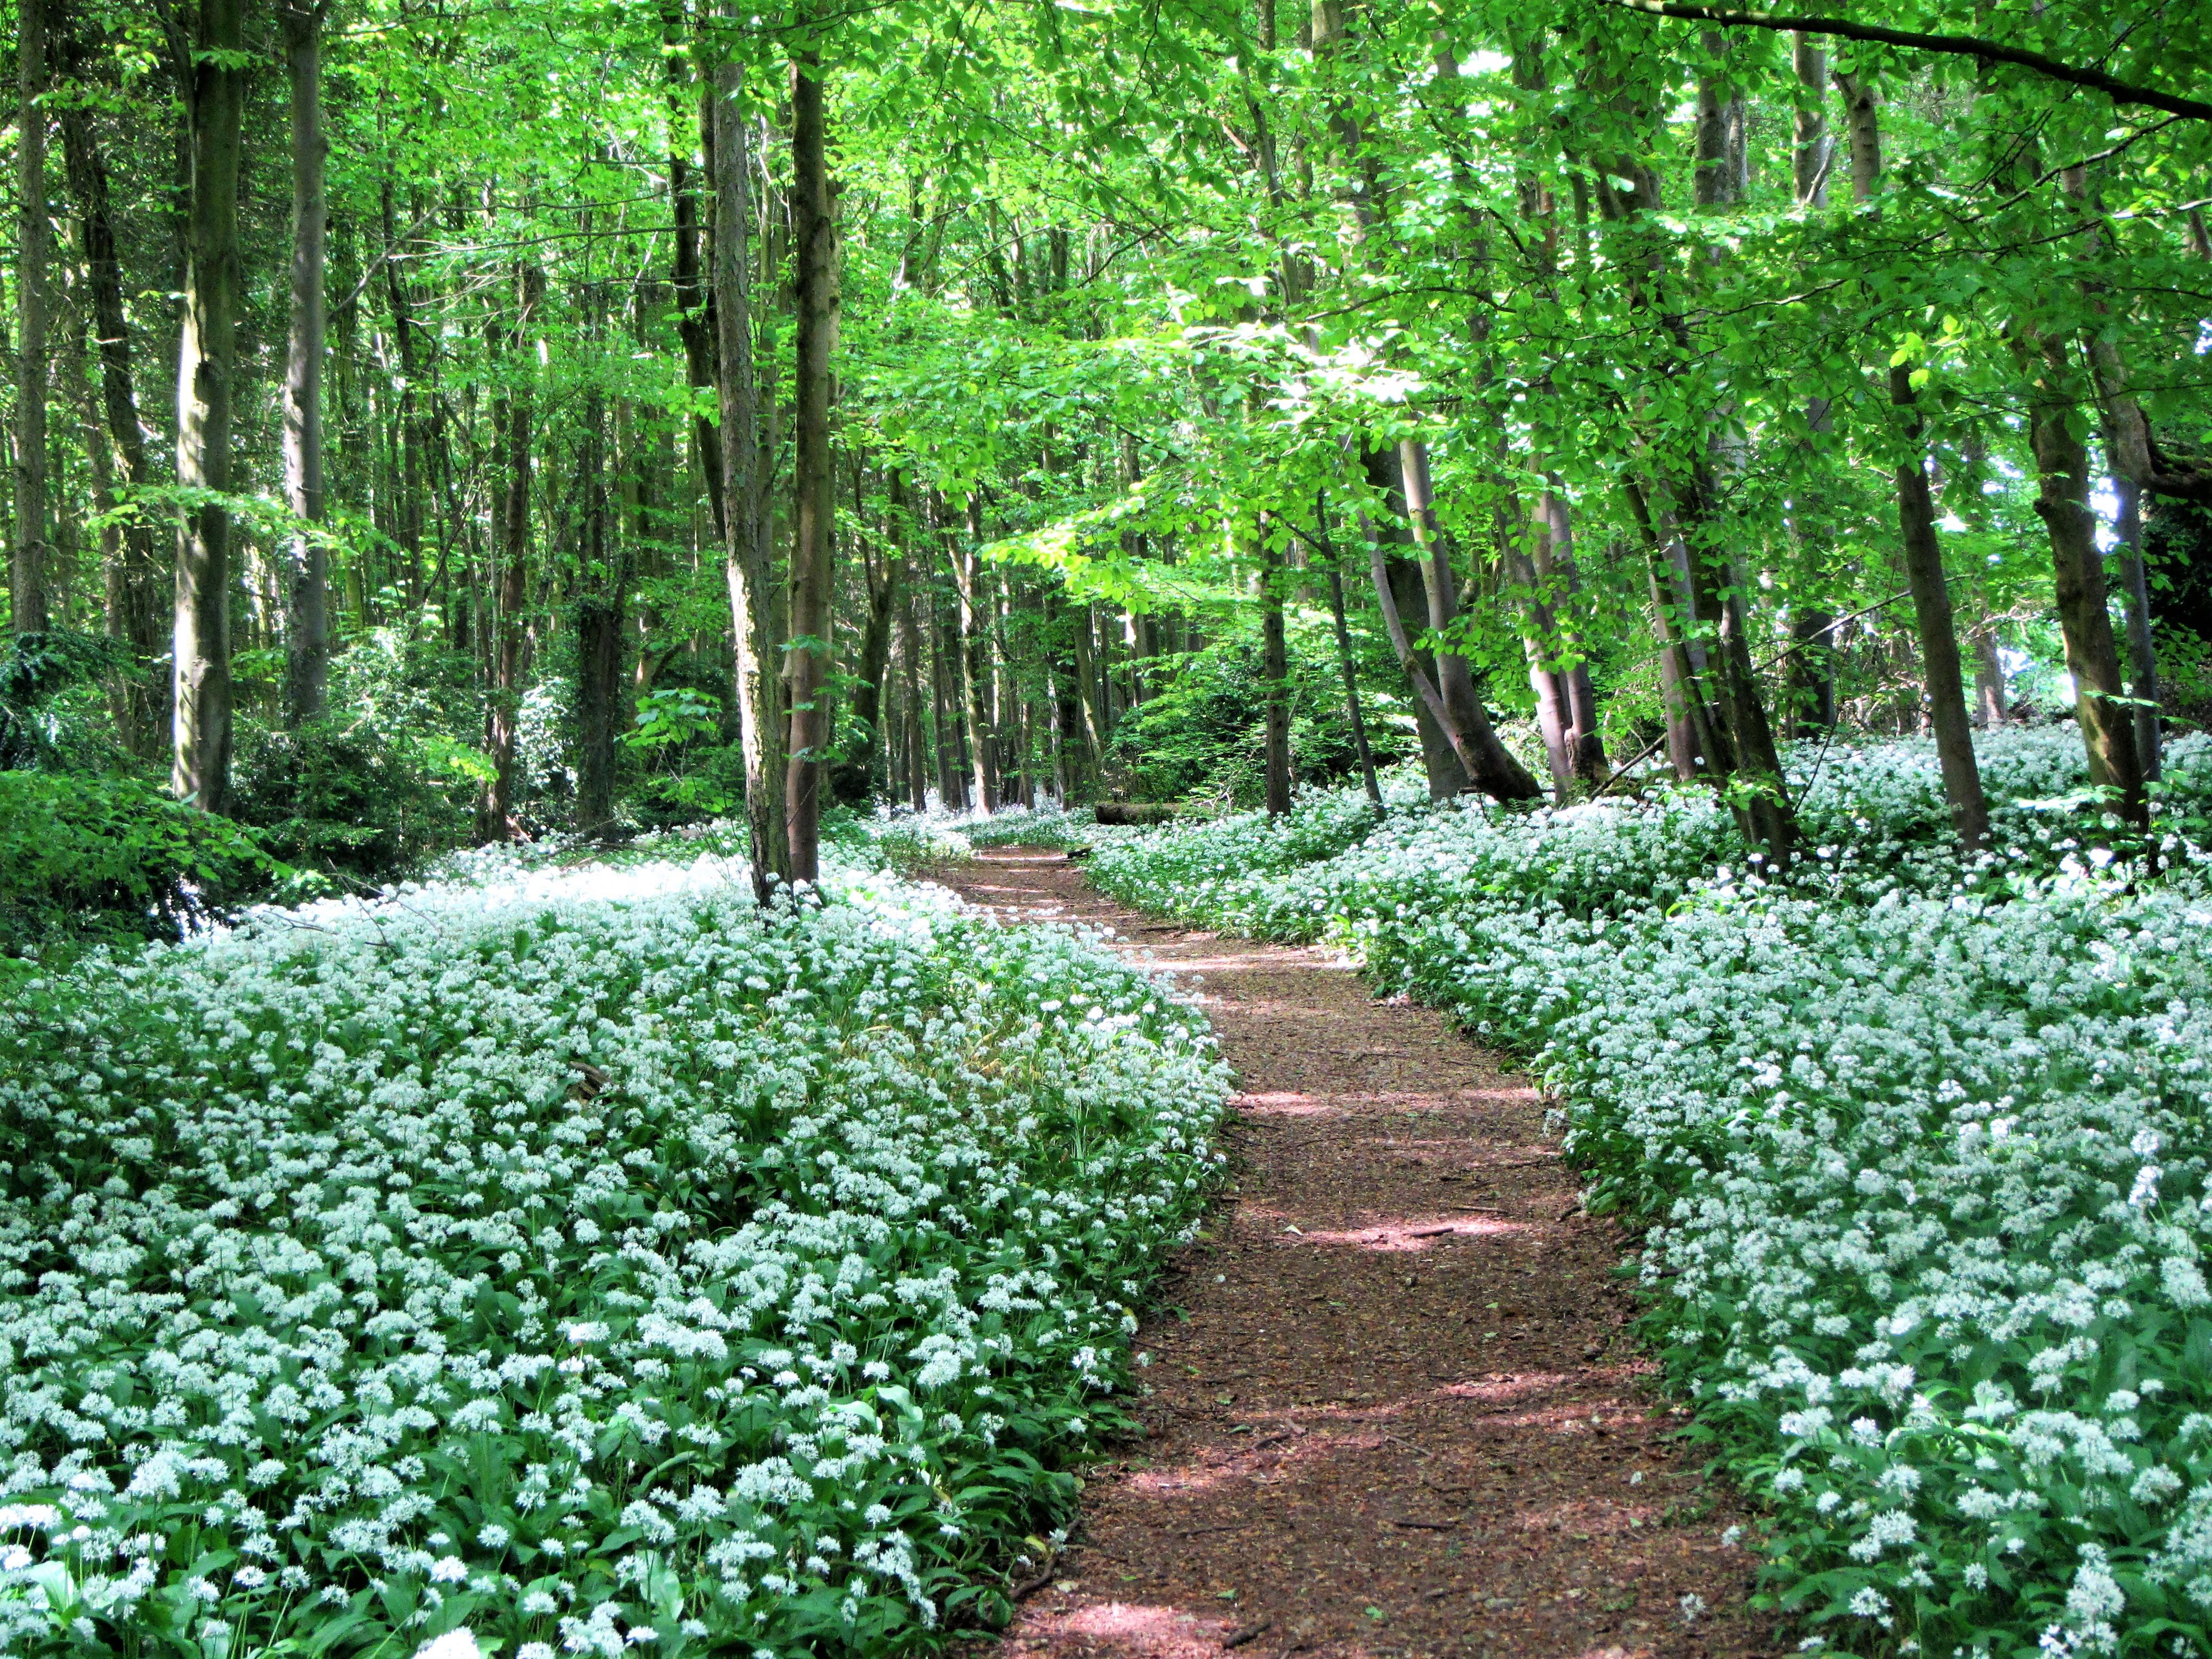 Conygre woods - footpath through wild garlic May 18